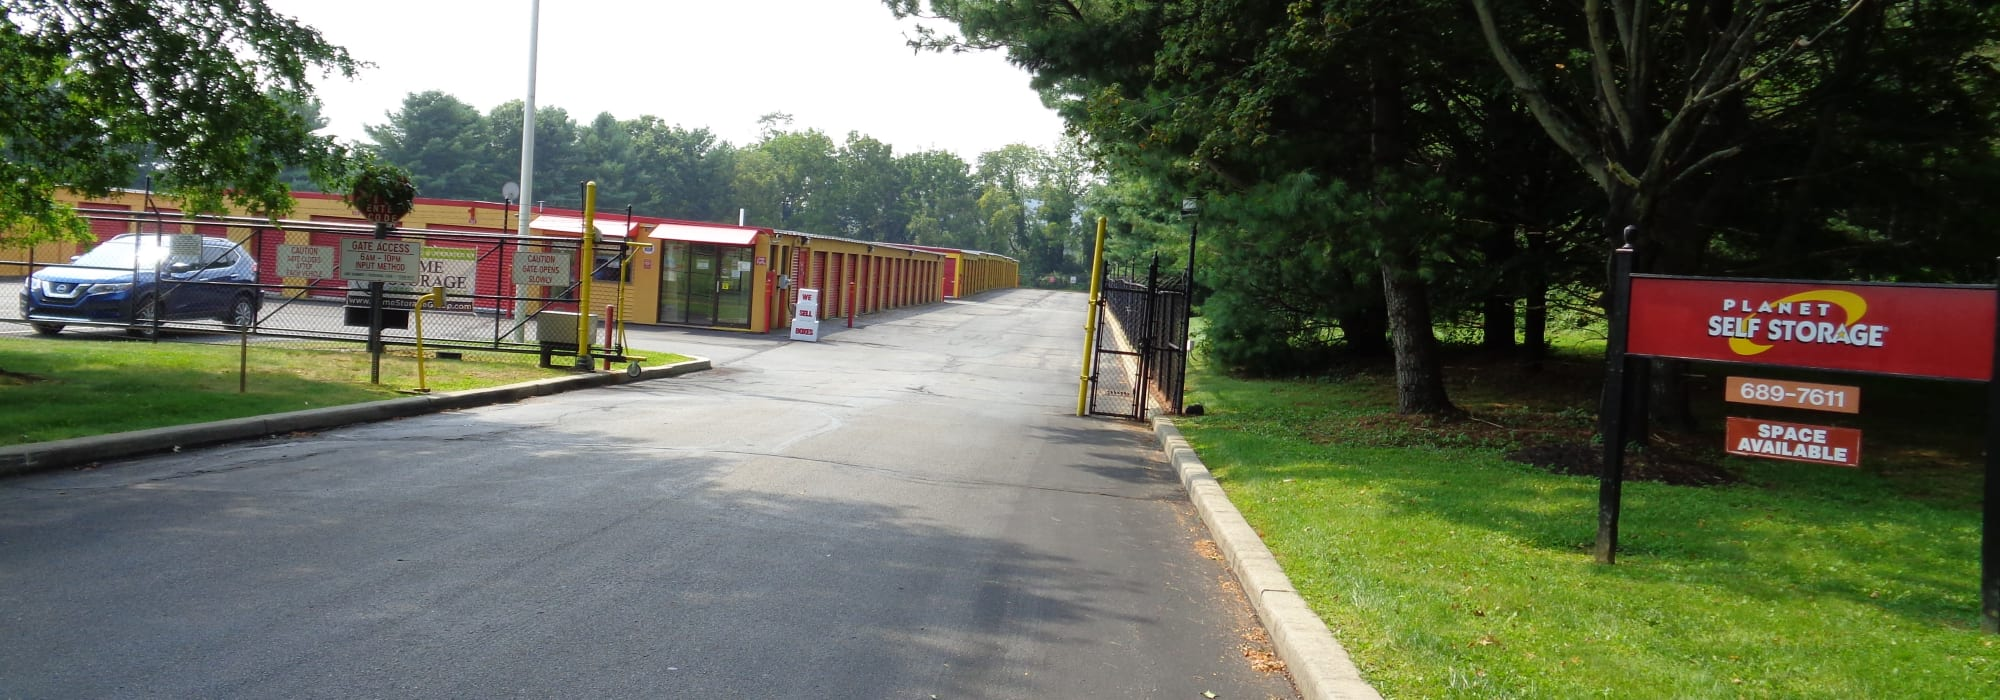 Prime Storage in Washington, NJ